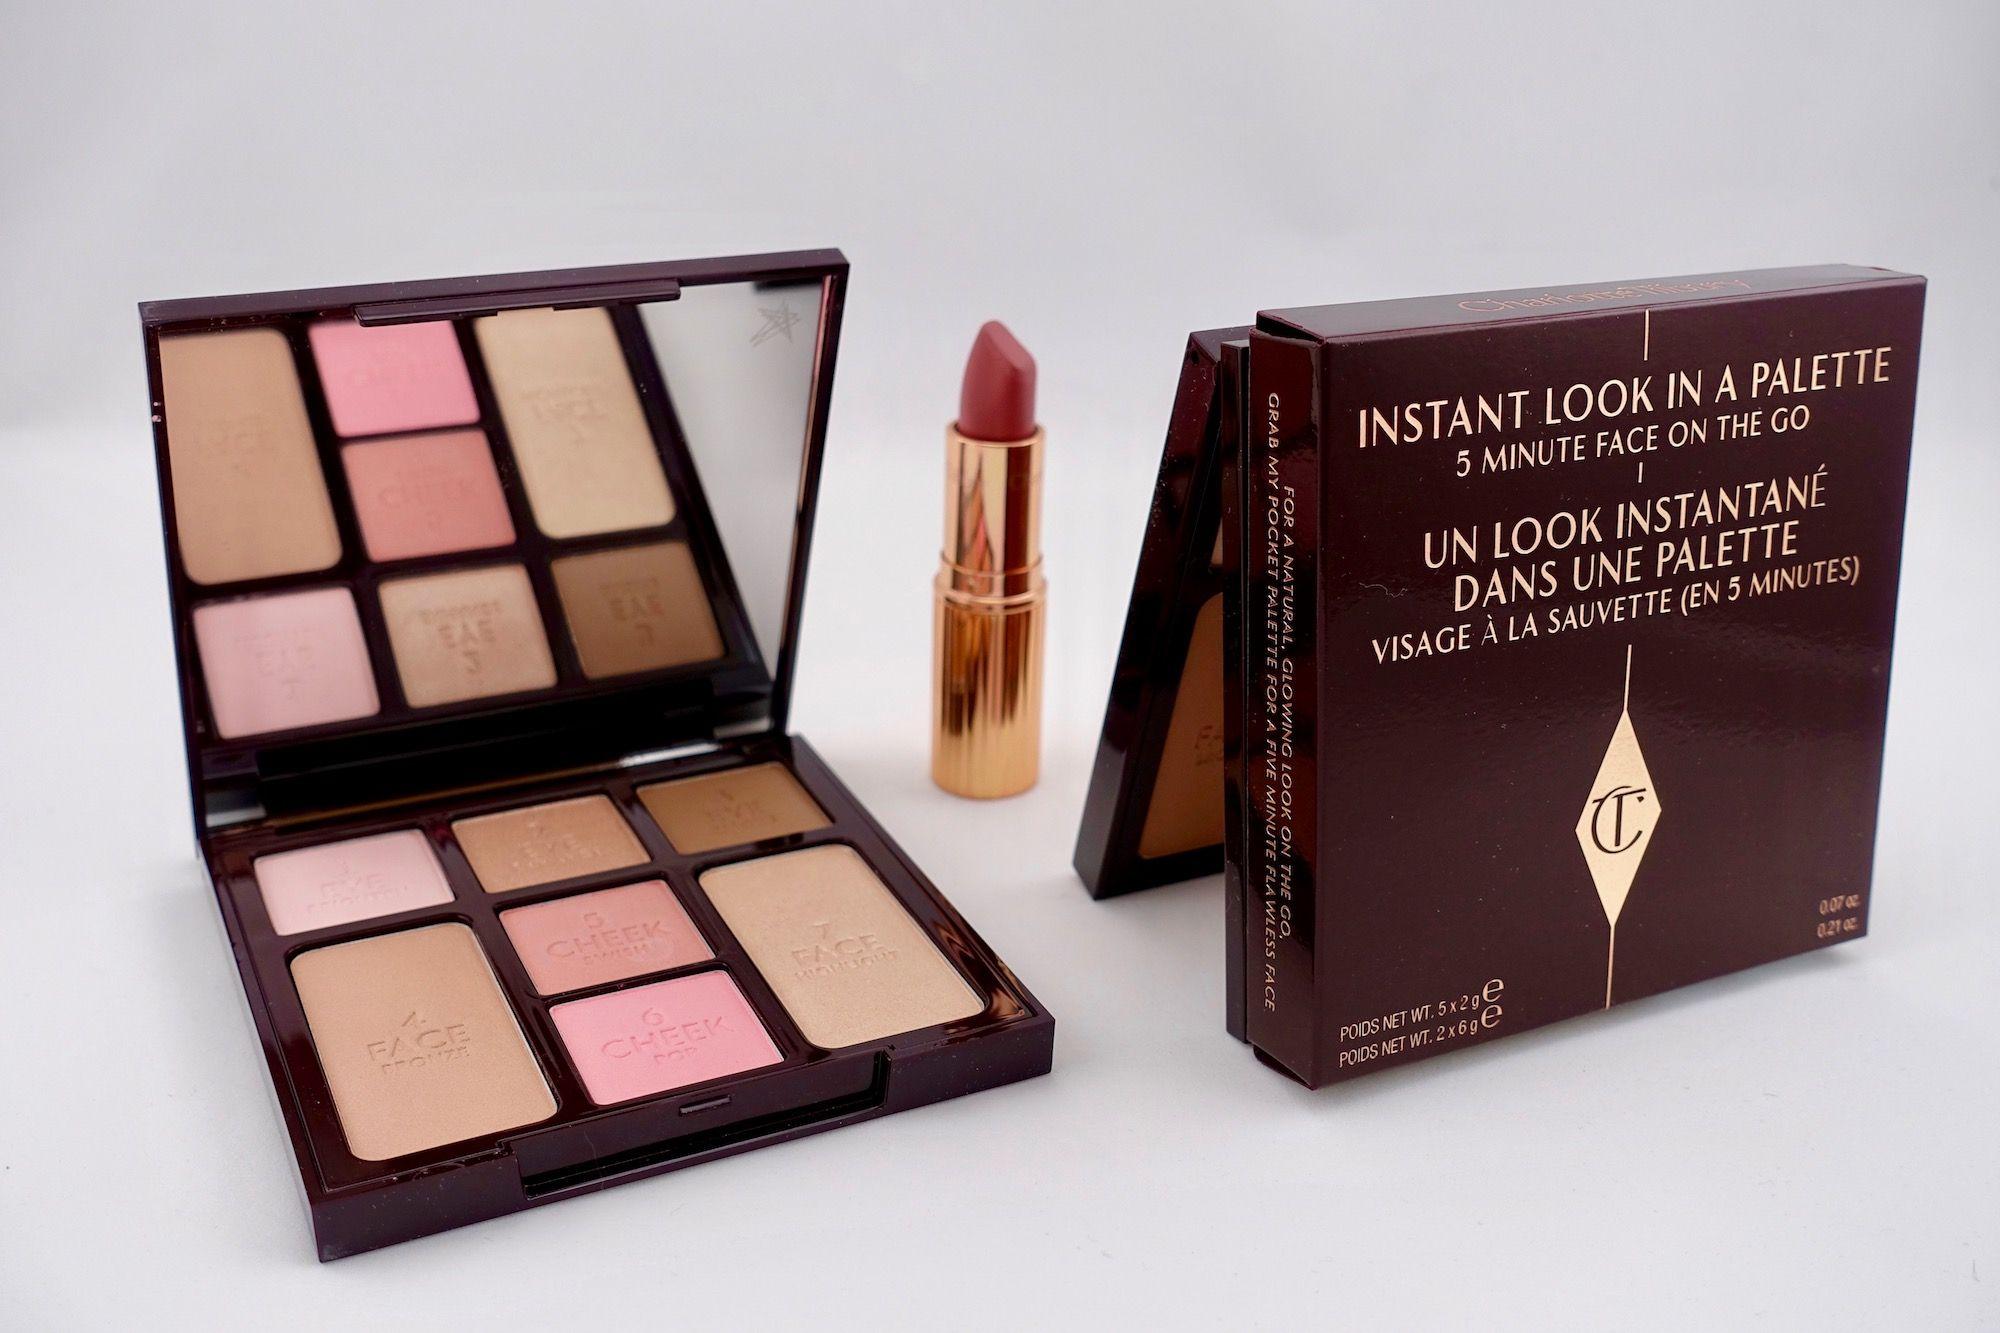 Charlotte Tilbury Instant Look Palette 5 minute Look Anverelle Review Natural Beauty Seductive Beauty 3